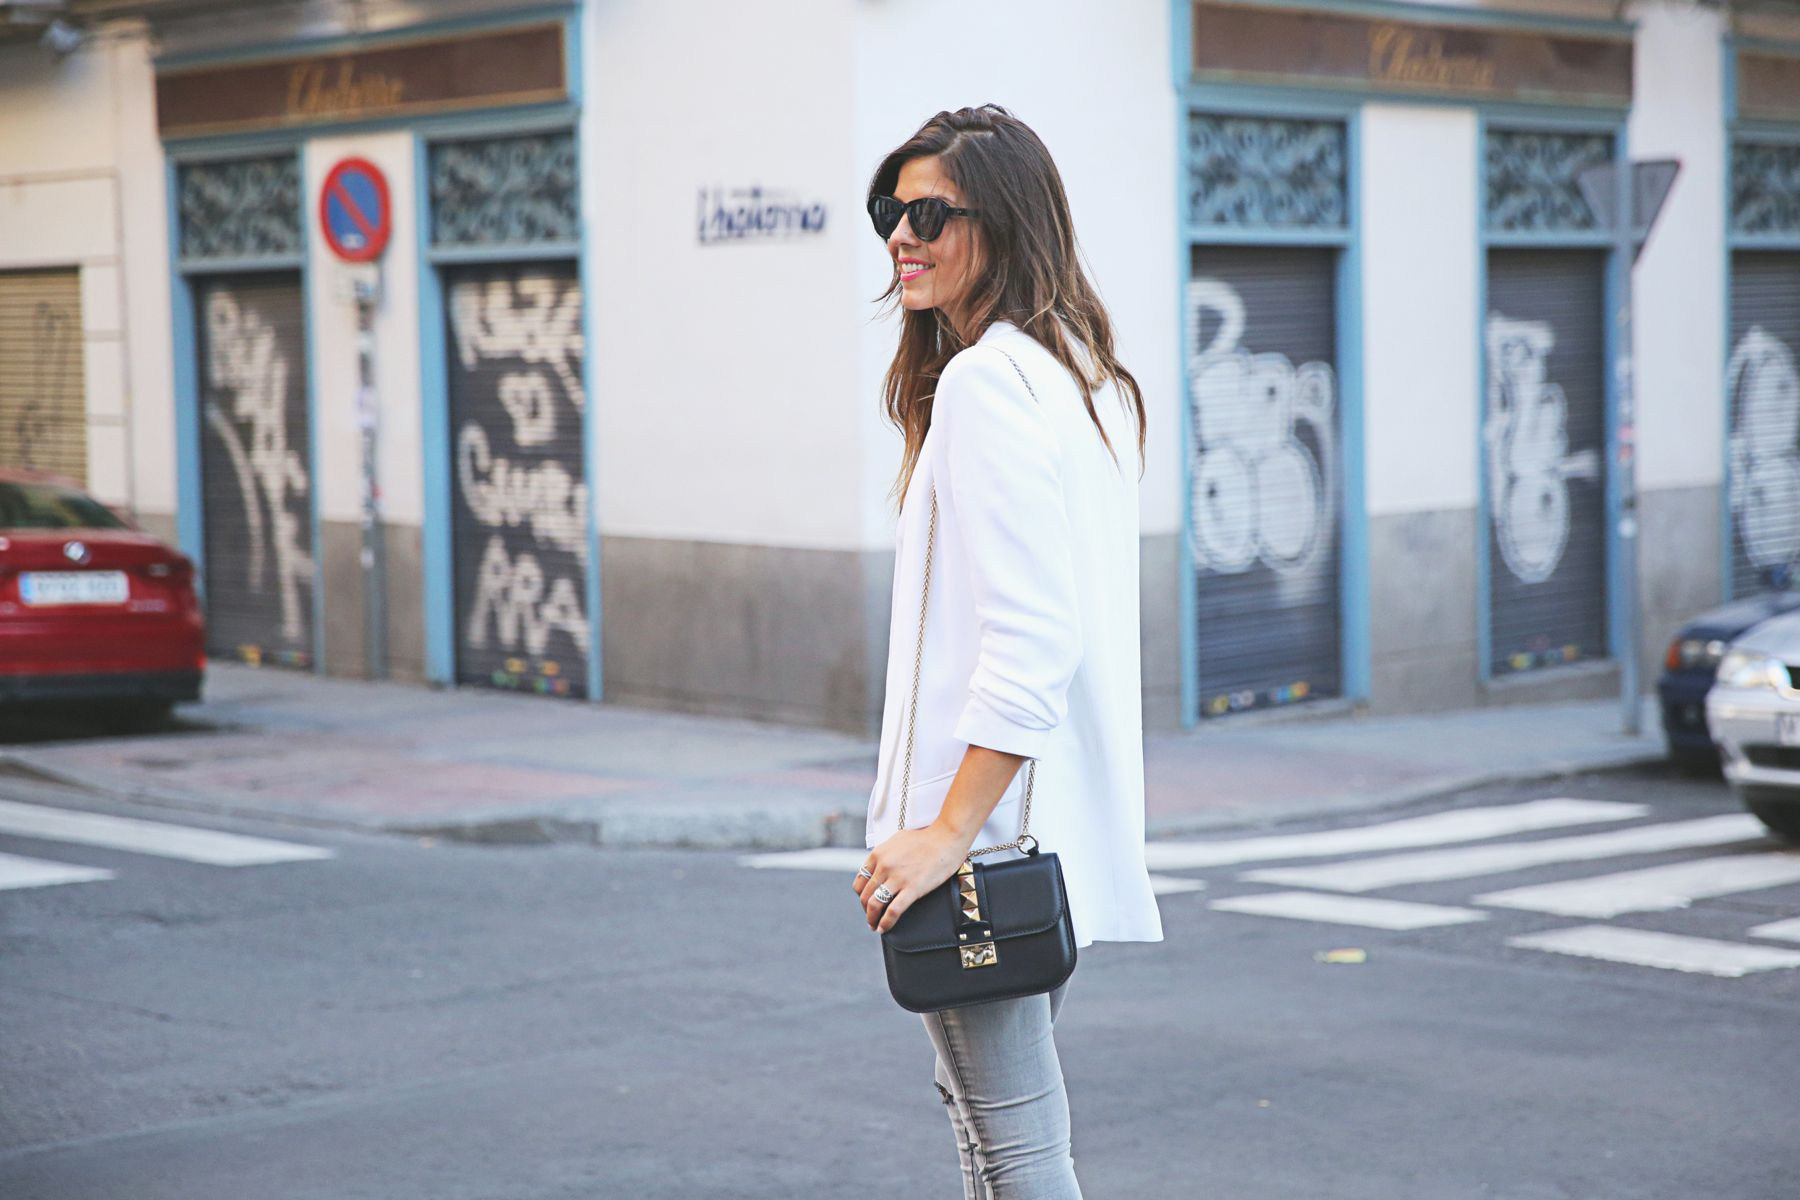 trendy-taste-look-outfit-street-style-ootd-blog-blogger-fashion-spain-moda-españa-SS15-verano2015-tendencias-trends-zara-buylevard-valentino-jessica-simpson-skinny-jeans-grey-white-blazer-americana-blanca-vaqueros-pitillo-sandalias-sandals-etnicas-9